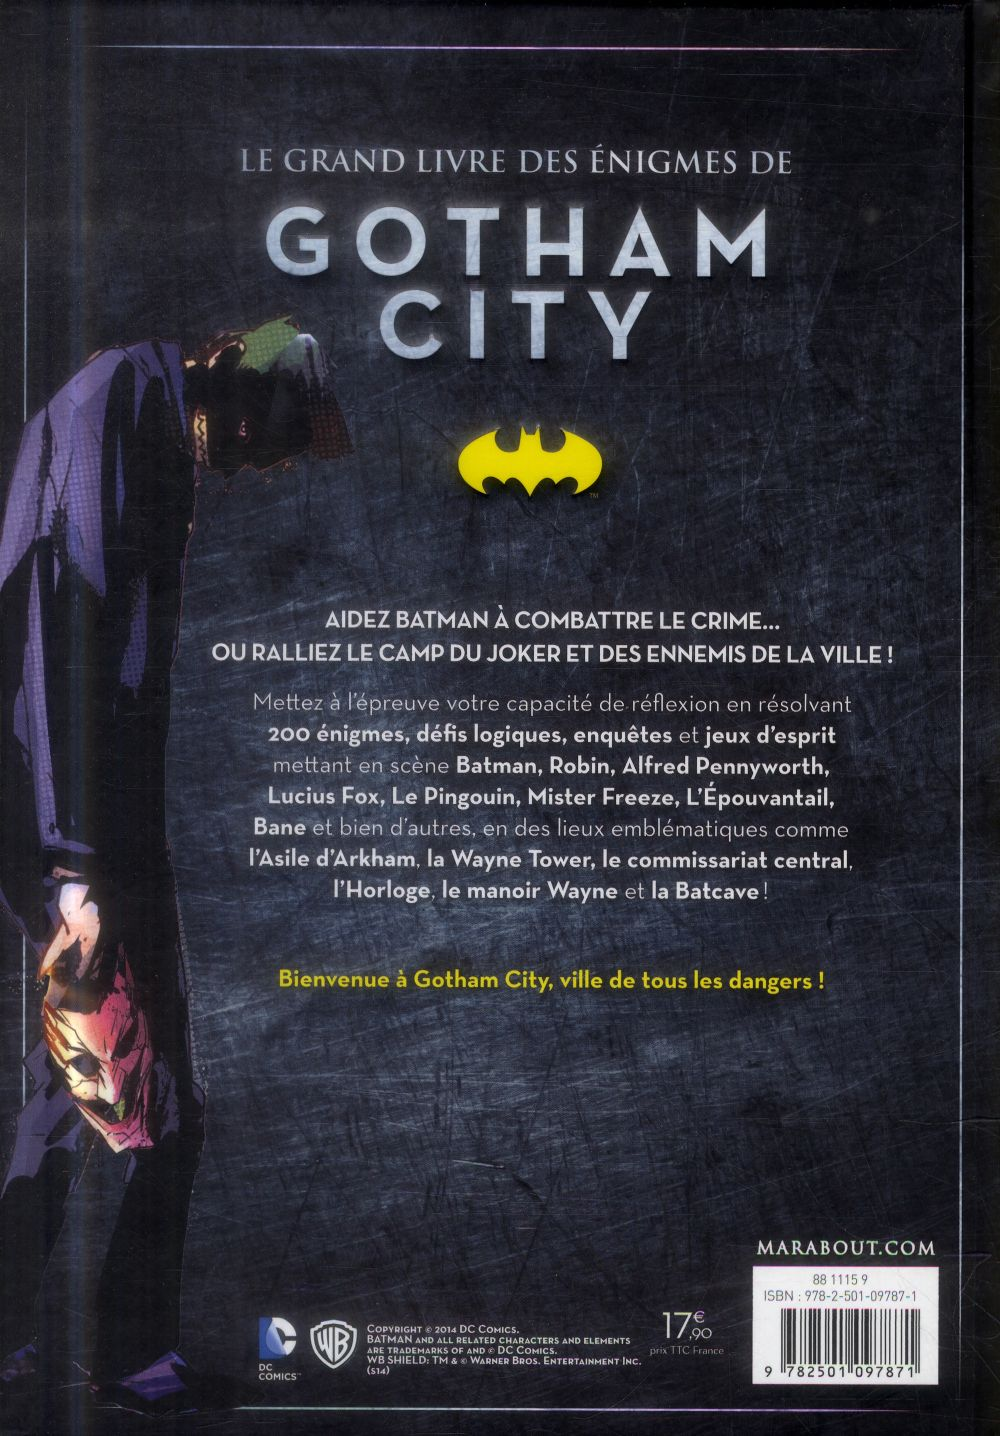 Grand livre des énigmes à Gotham City